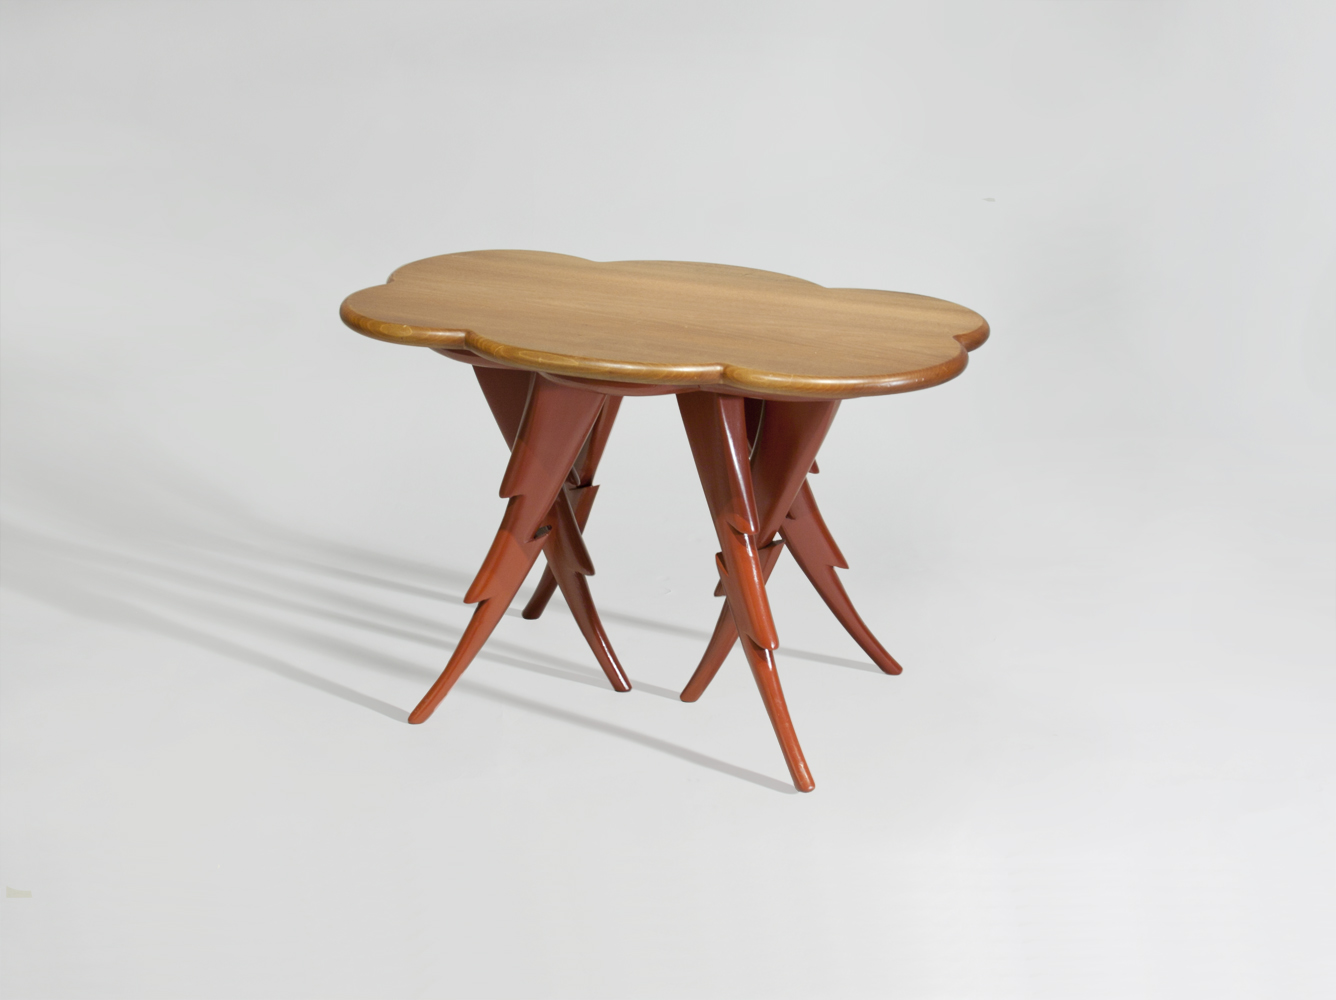 Robert Whitley  'Bolt' Table 1